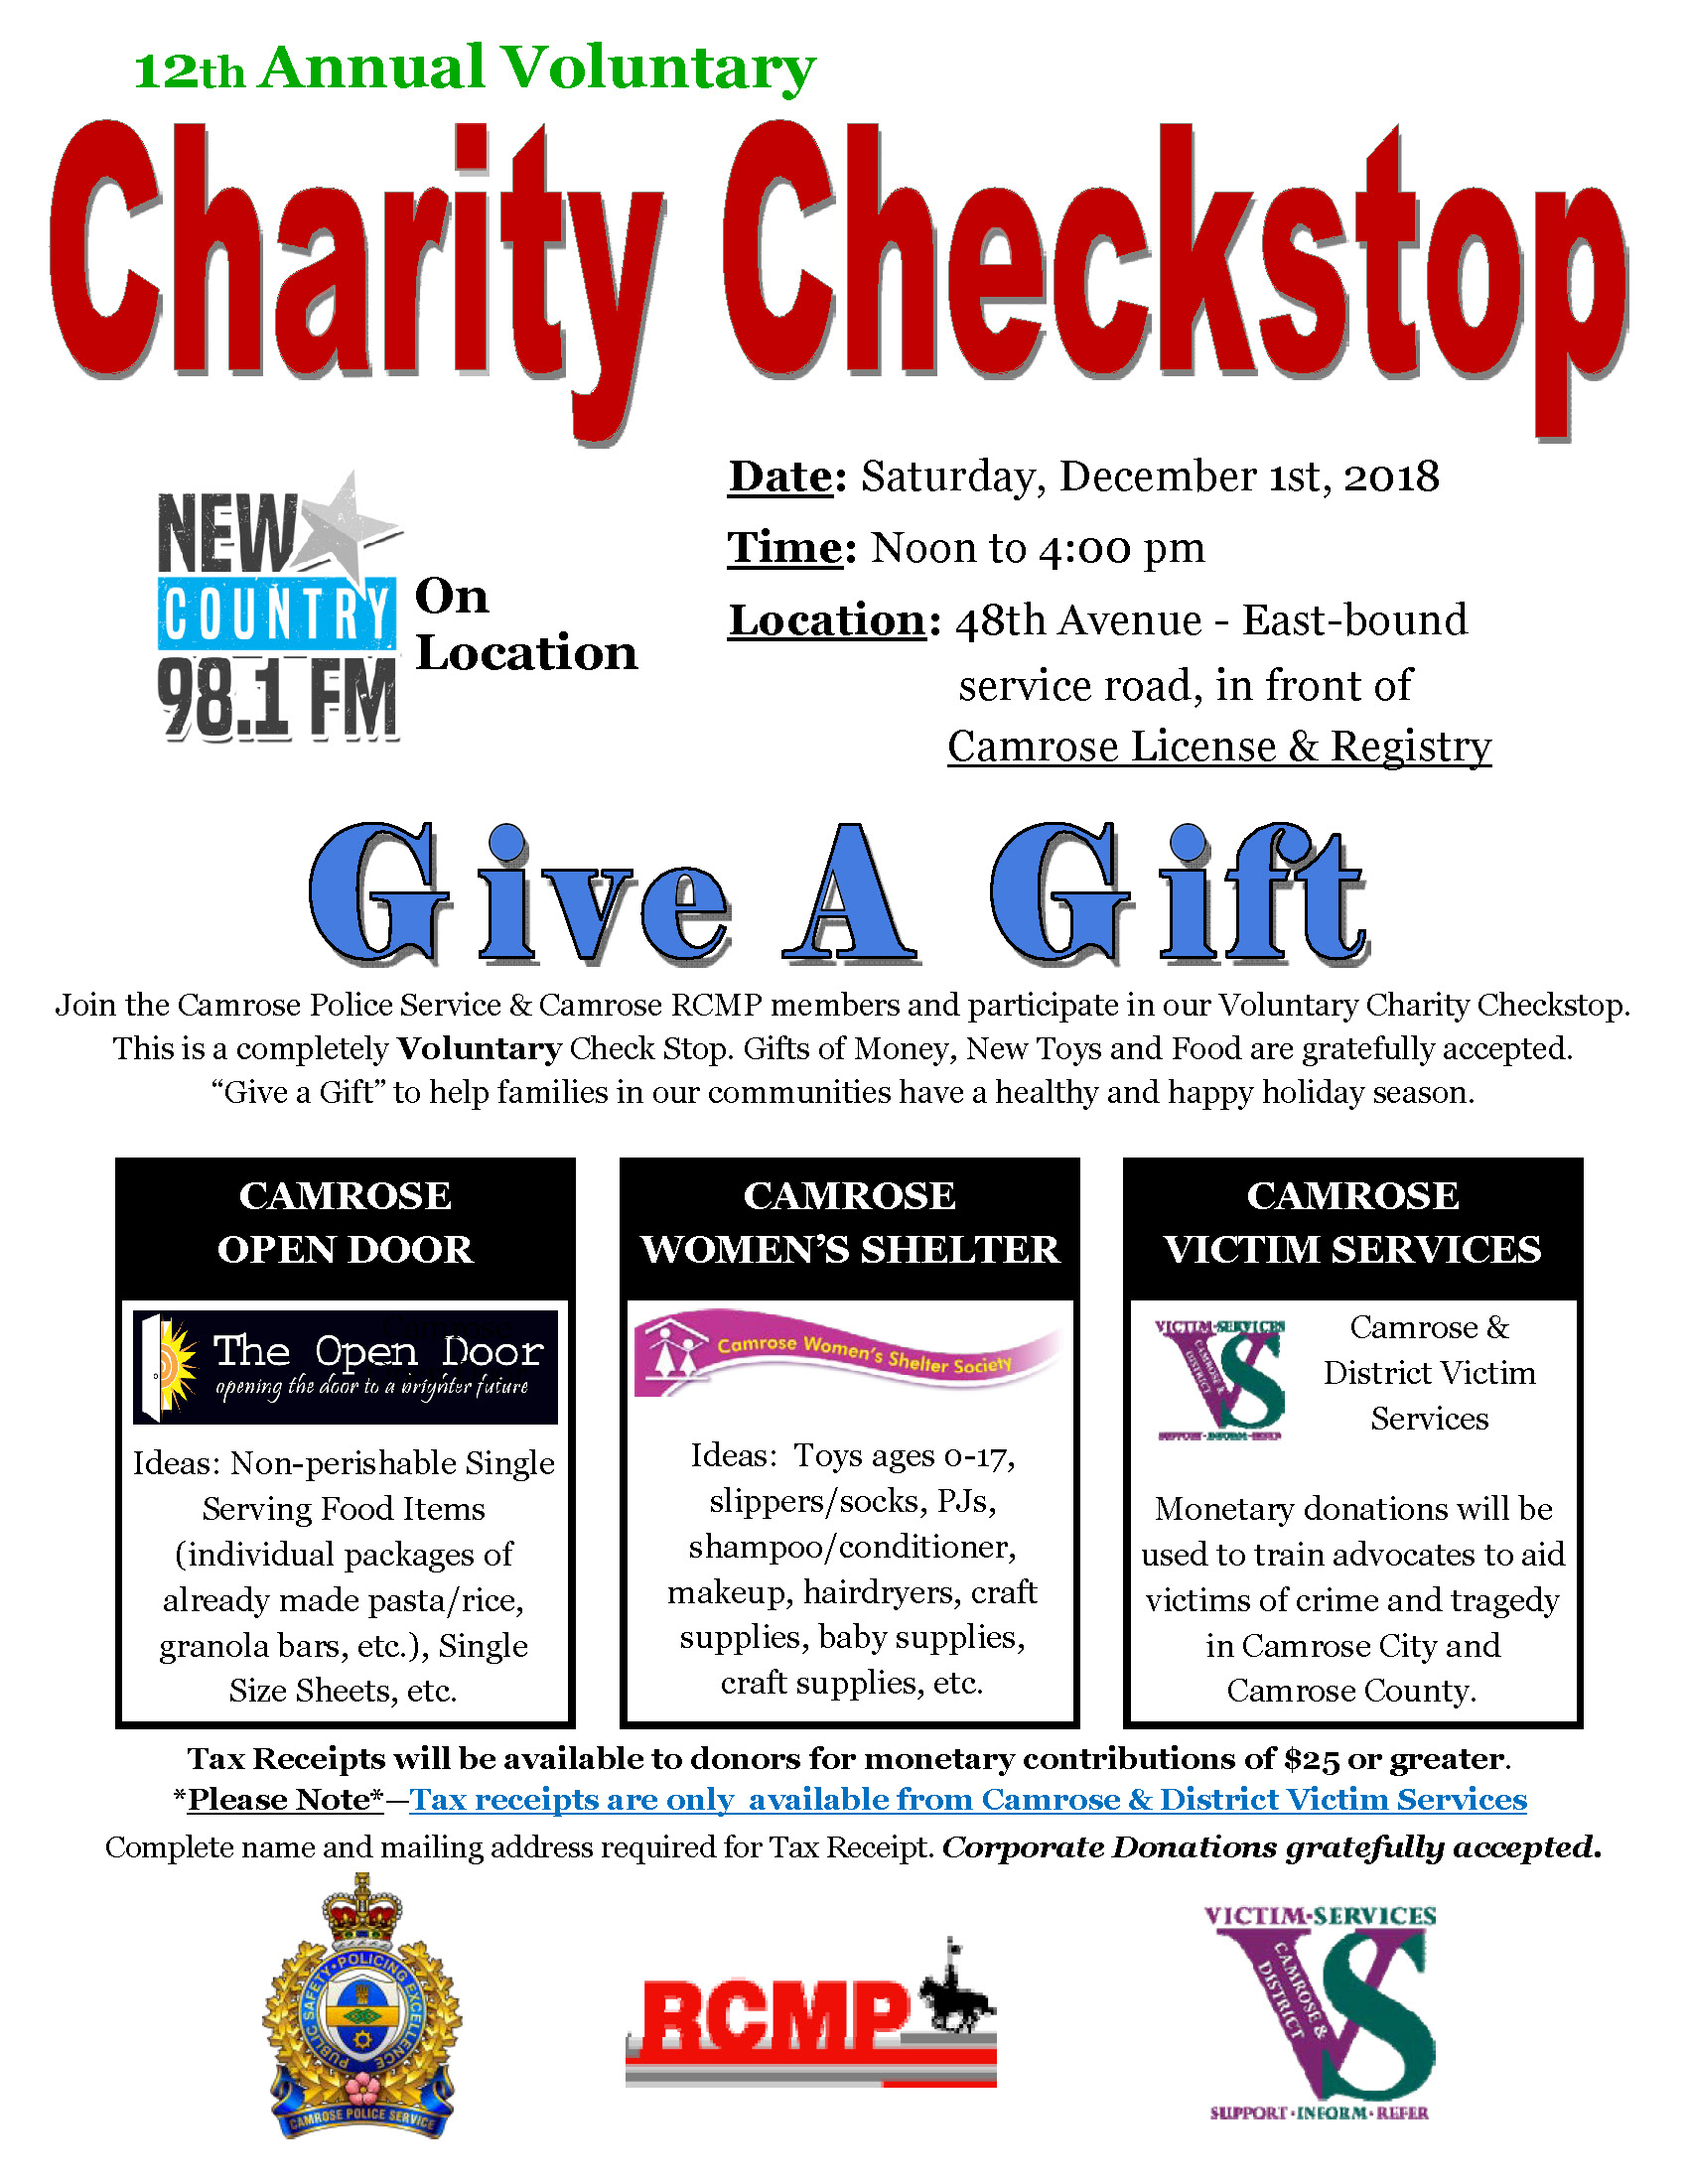 Charity Checkstop Poster 2018.jpg